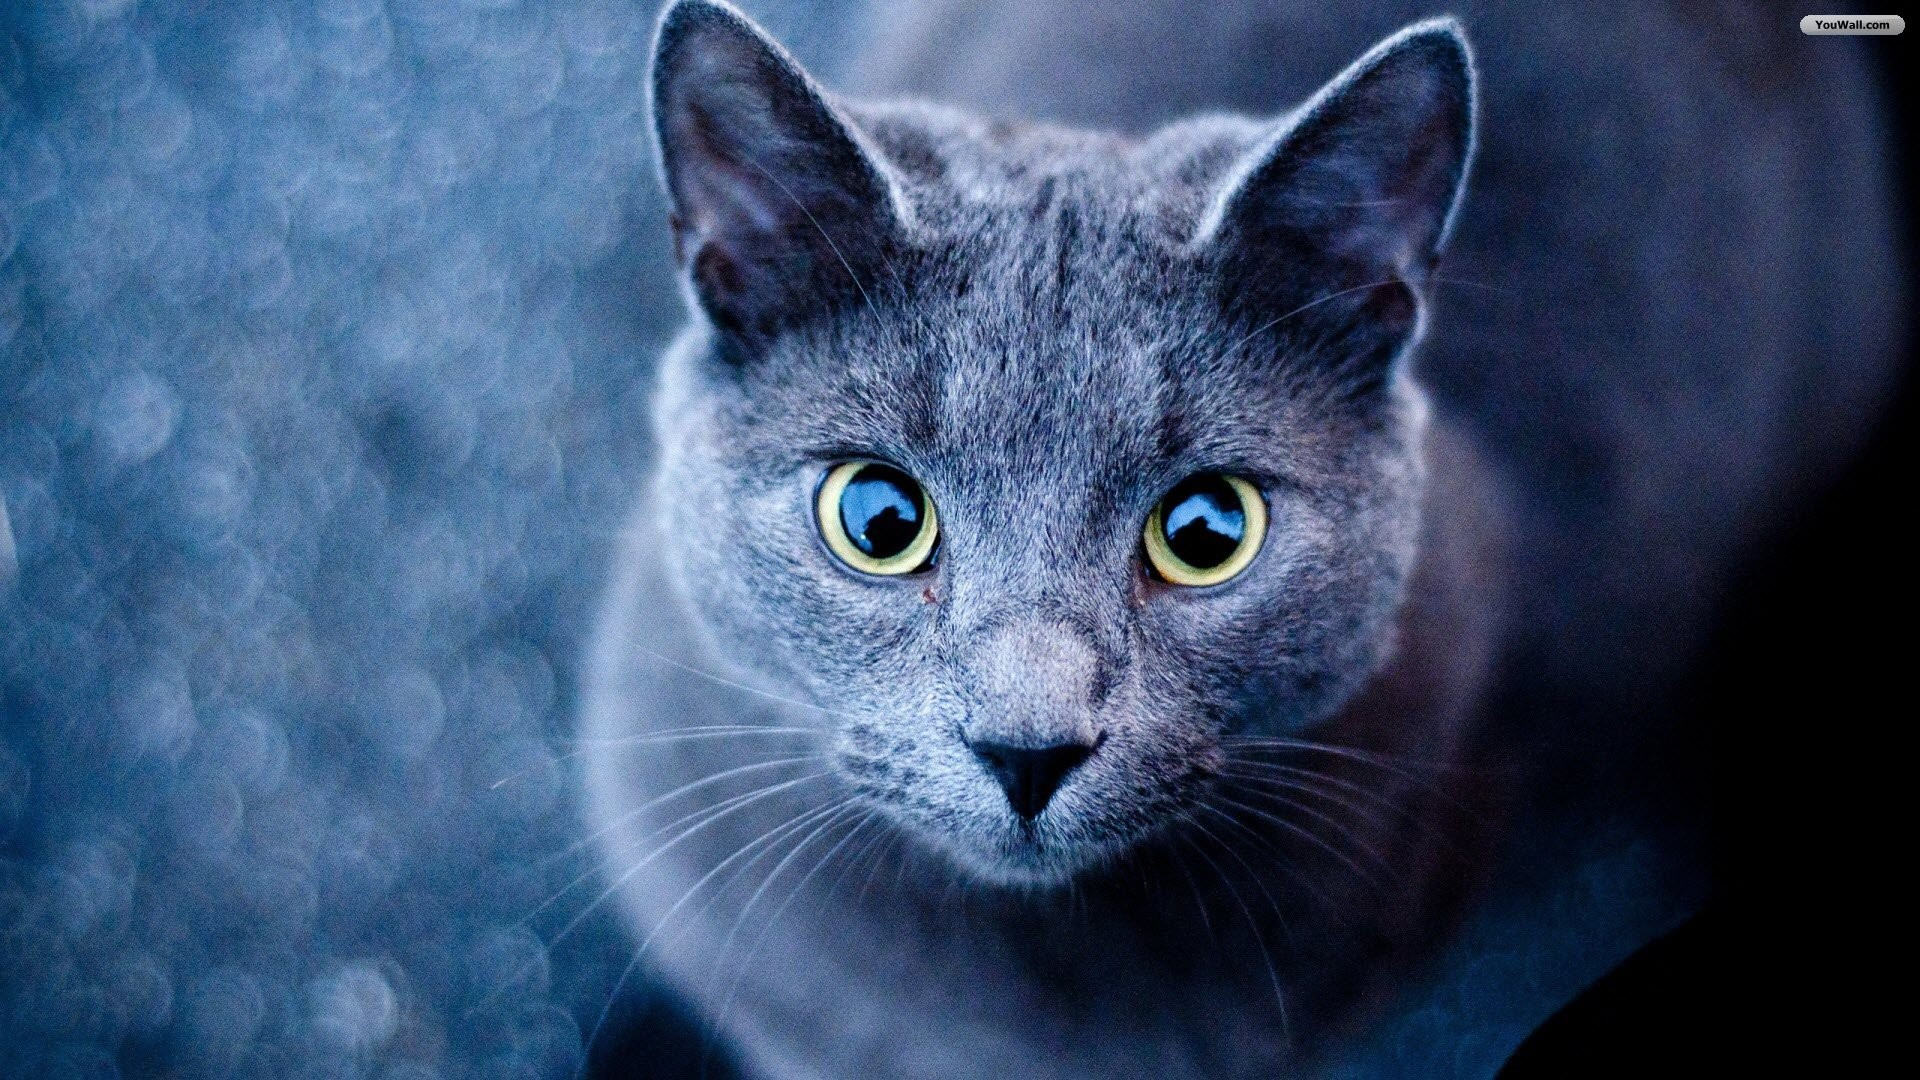 Warrior cats backgrounds wallpapertag - Cute kittens hd wallpaper free download ...